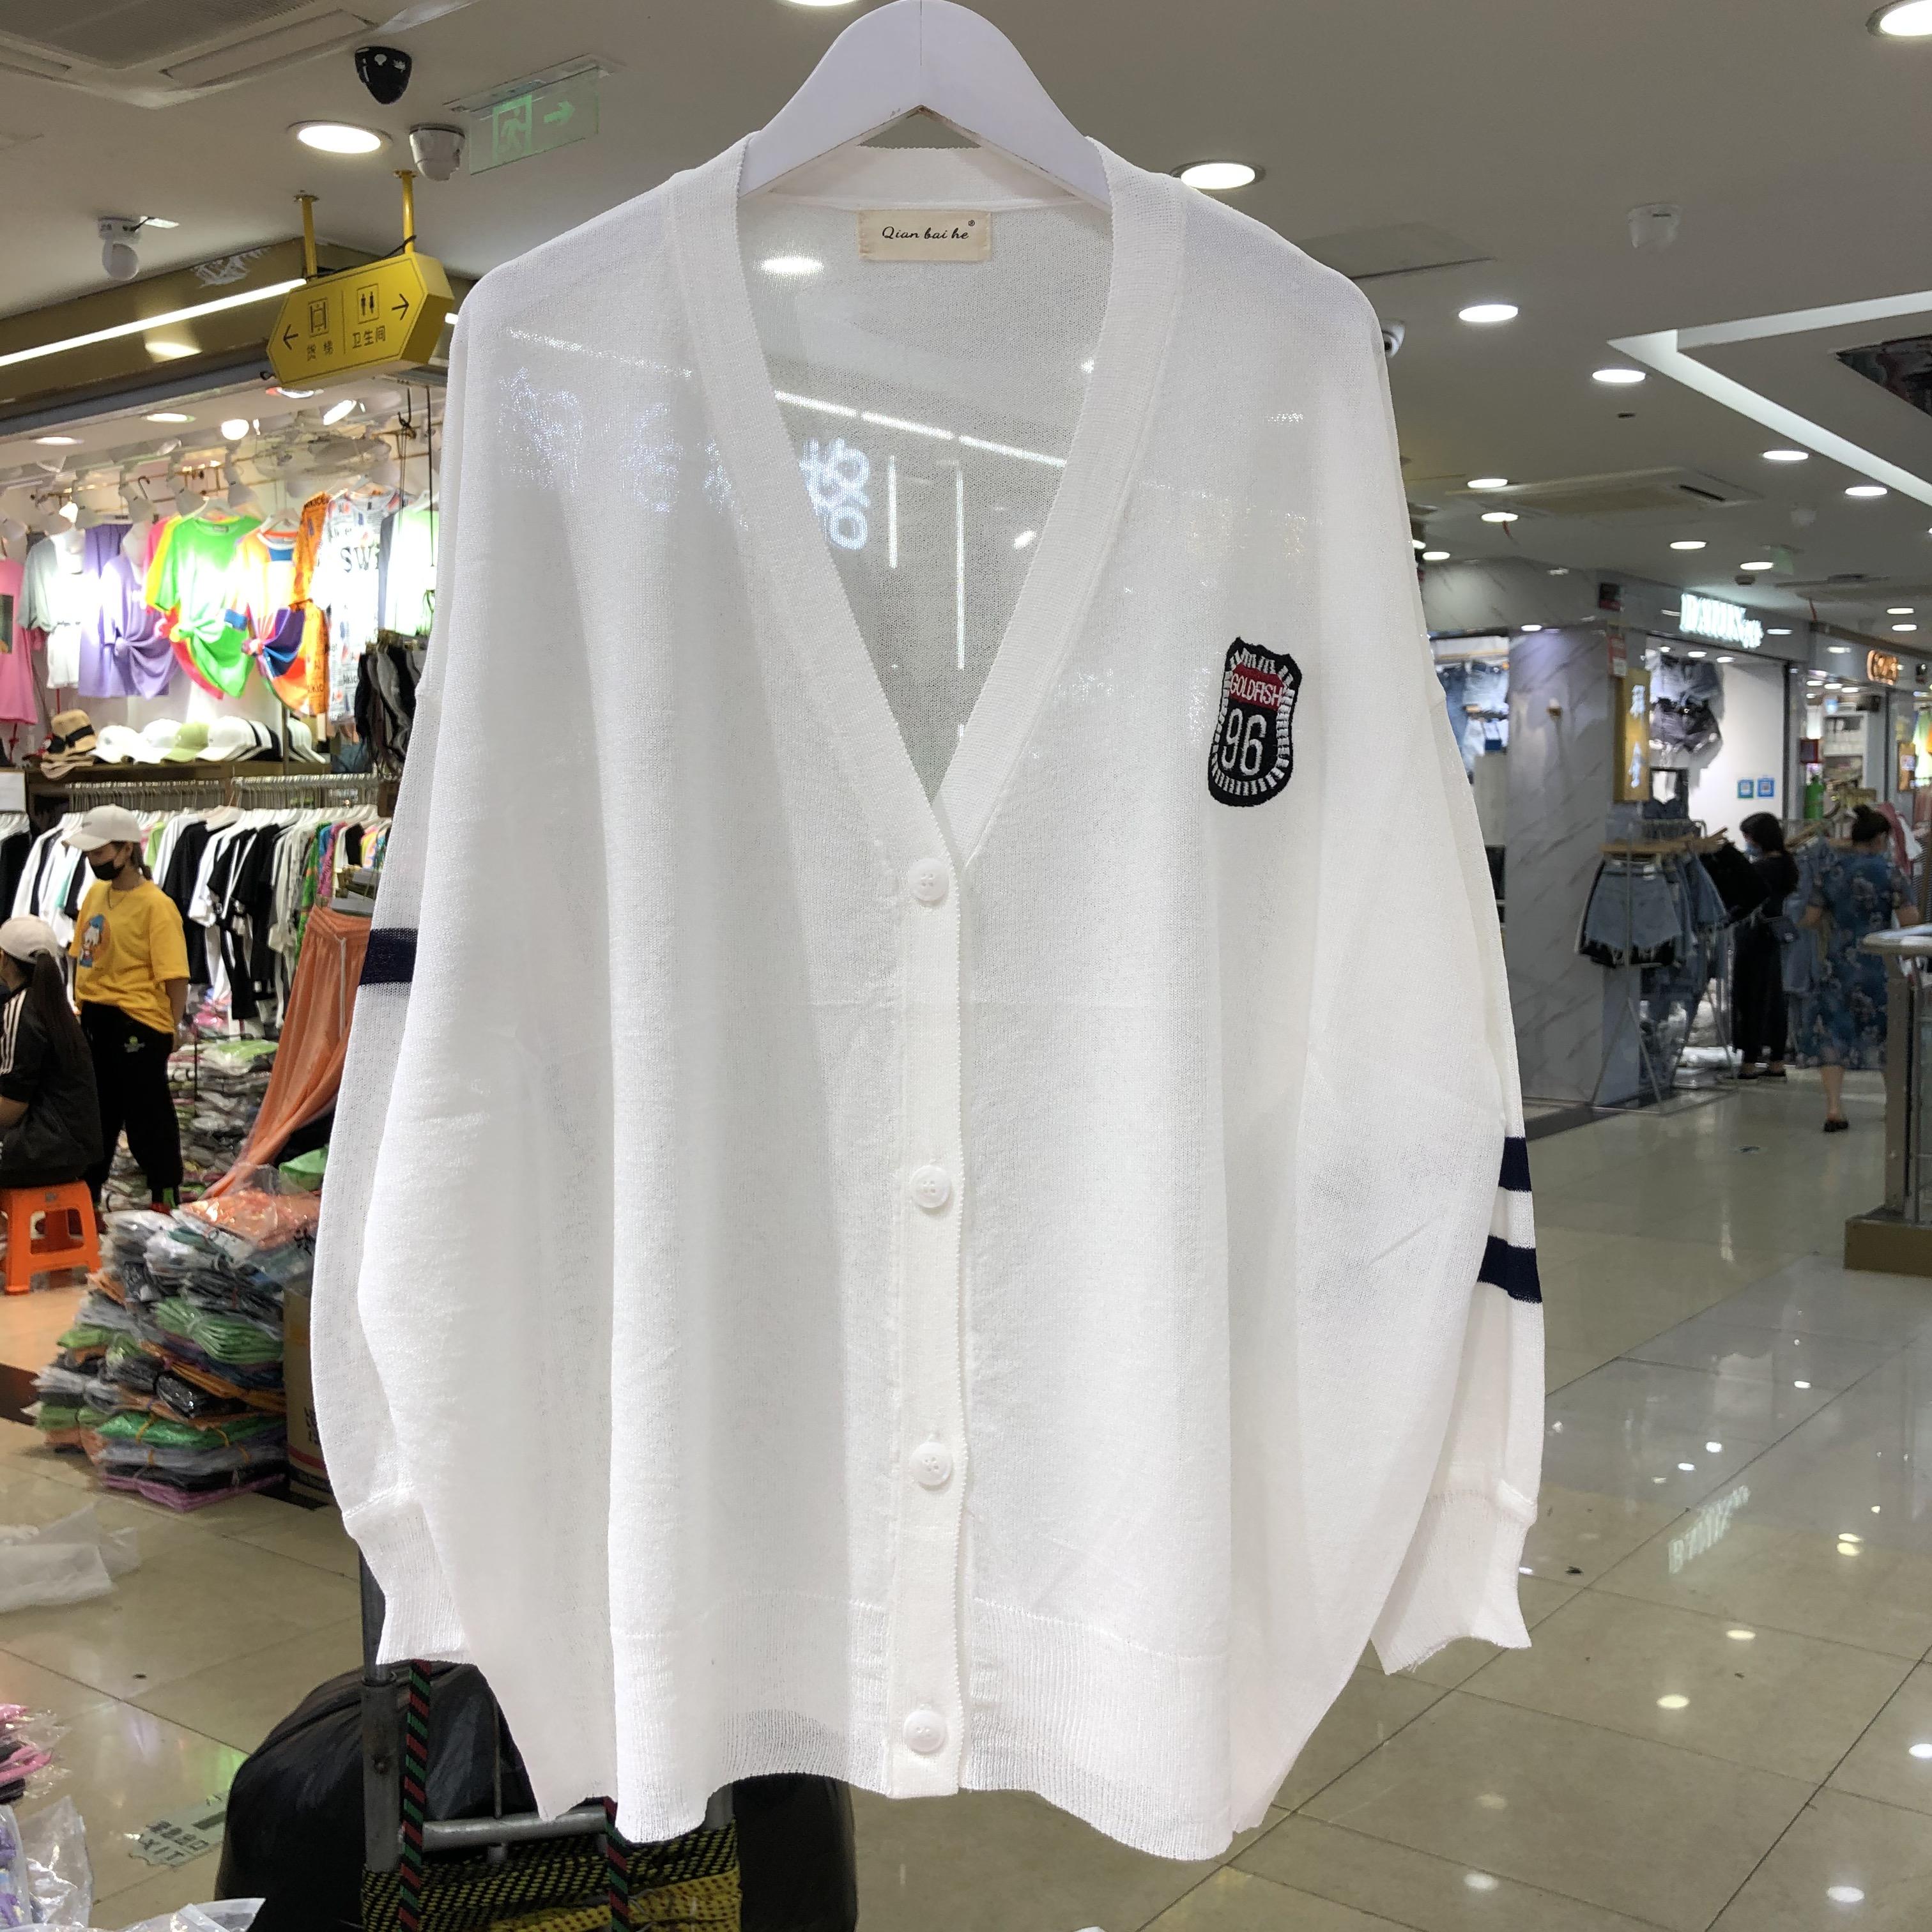 Qian bai he仟佰禾怒推!2020夏季V领长袖冰丝麻针织开衫外穿宽松